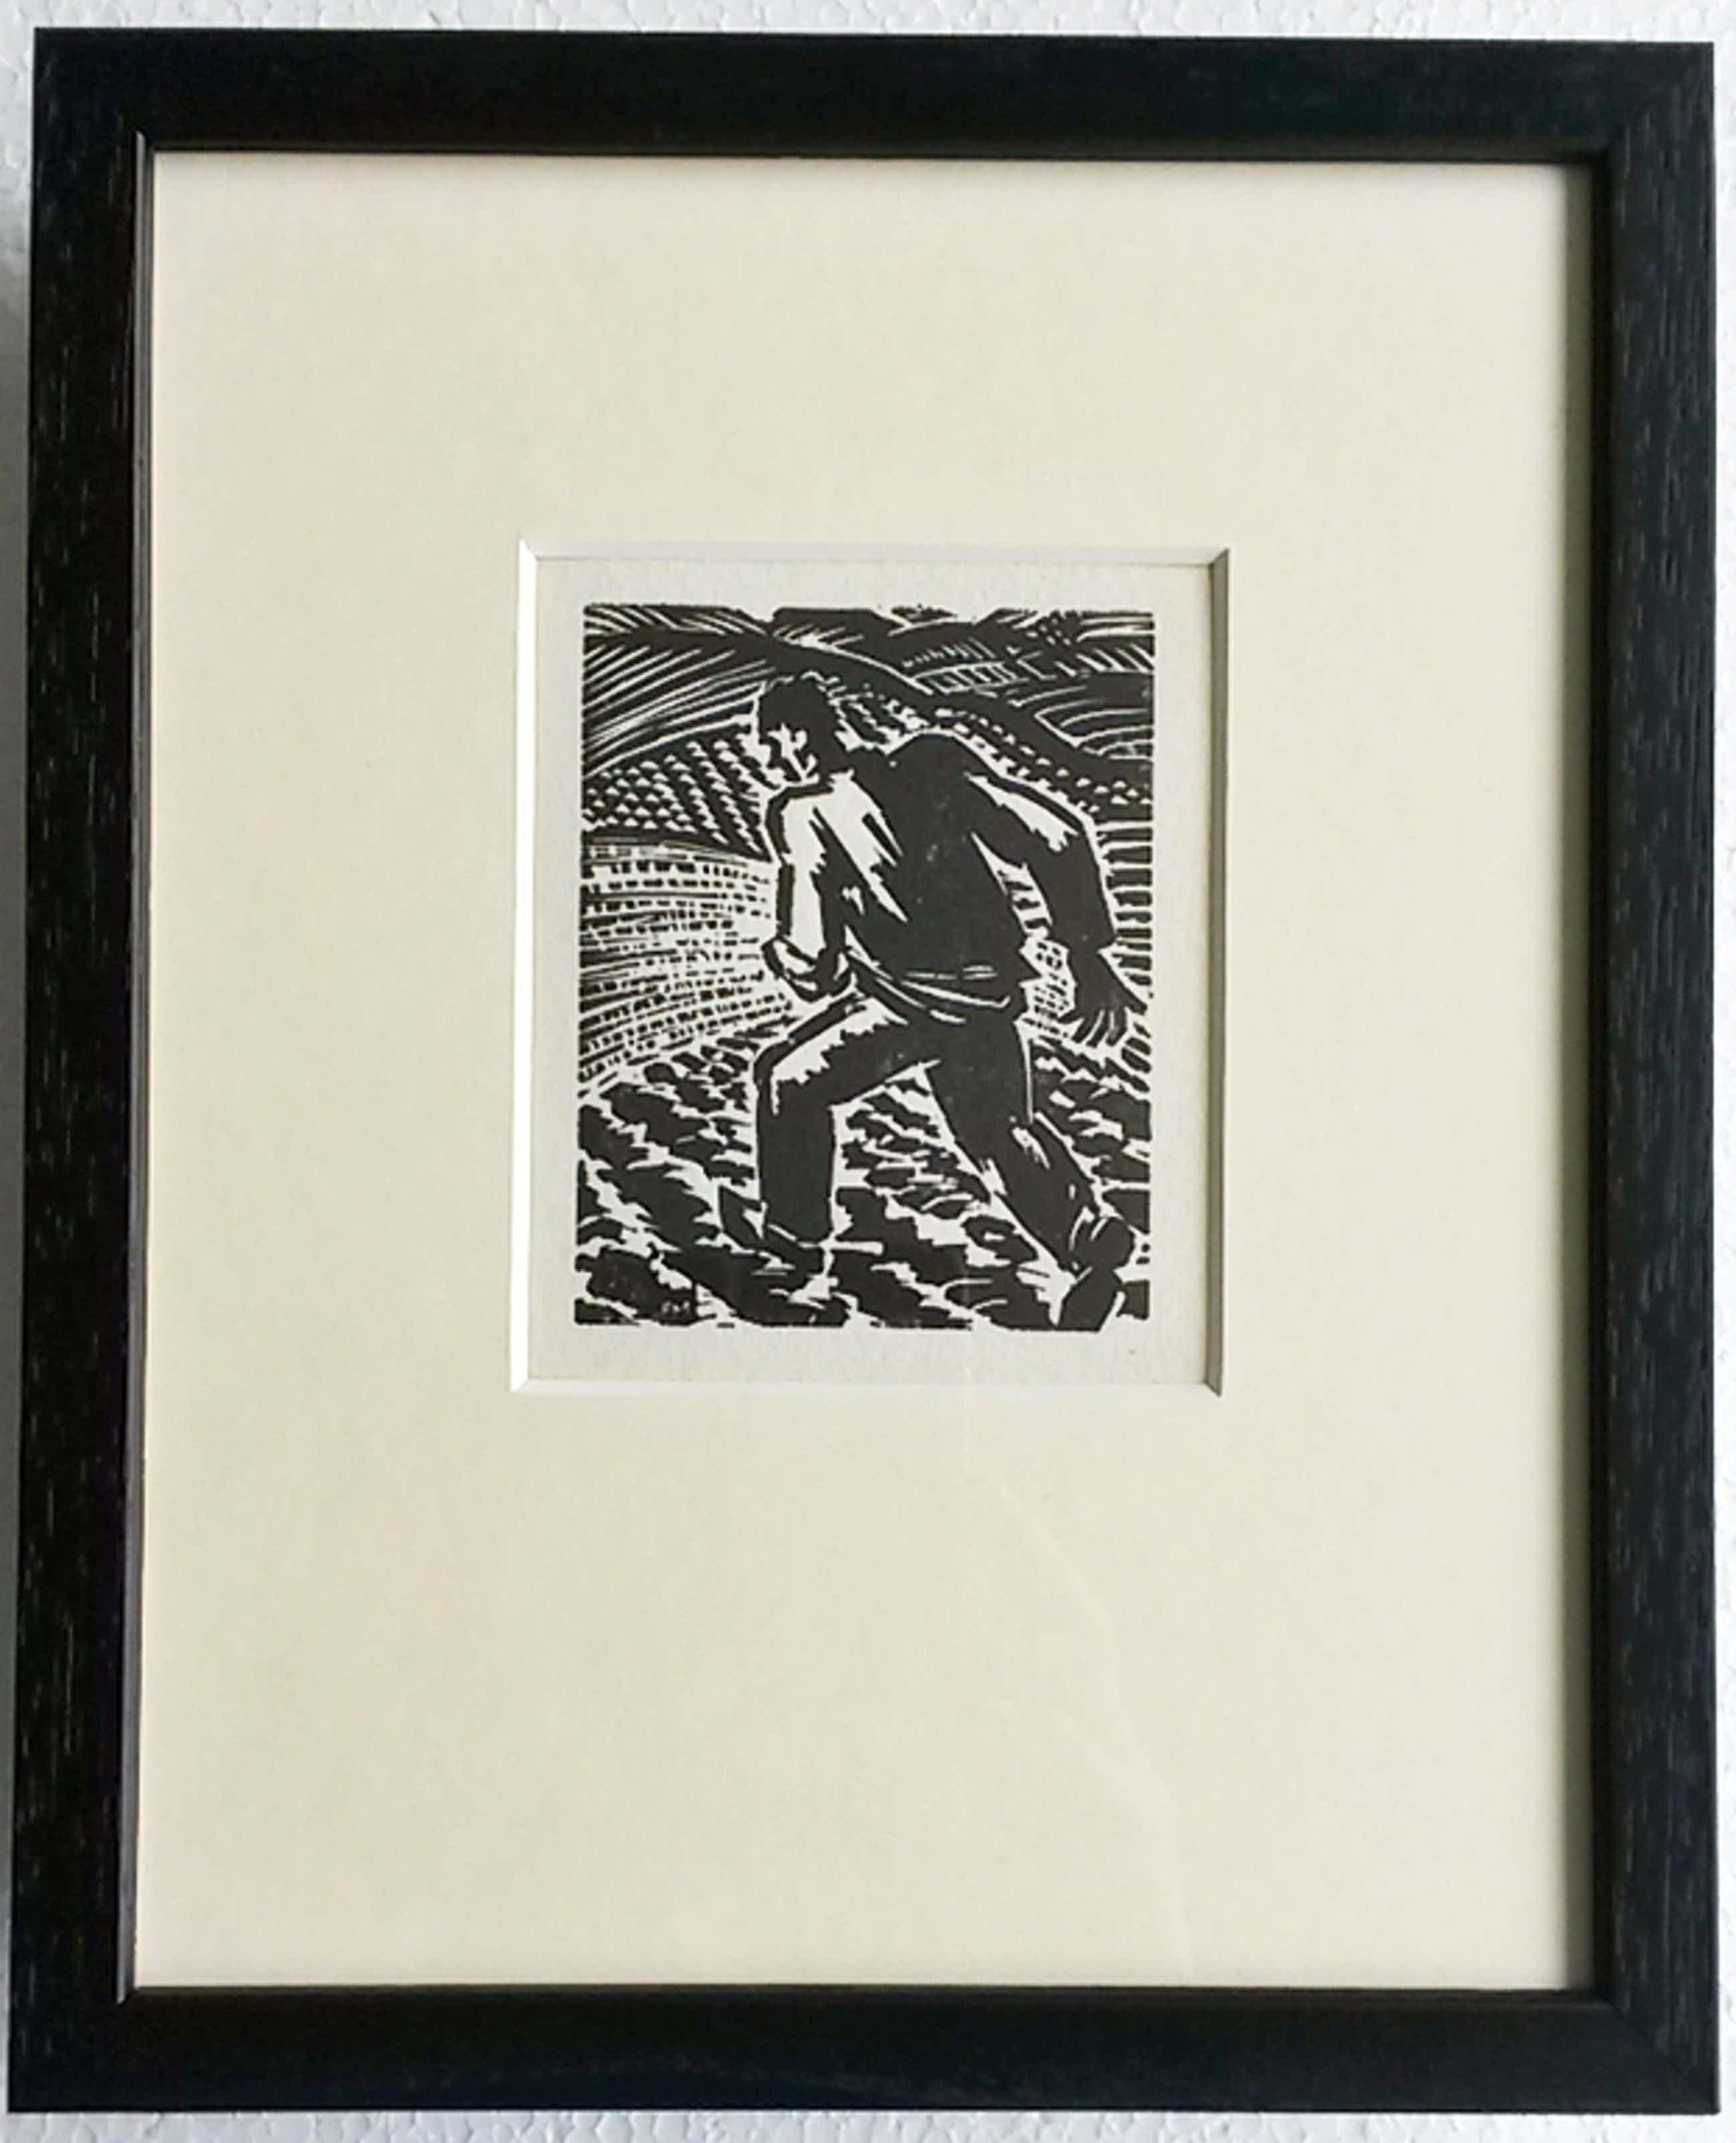 Frans Masereel, houtsnede, uit Ecce Homo 1949, Sämann (Zaaier) kopen? Bied vanaf 55!